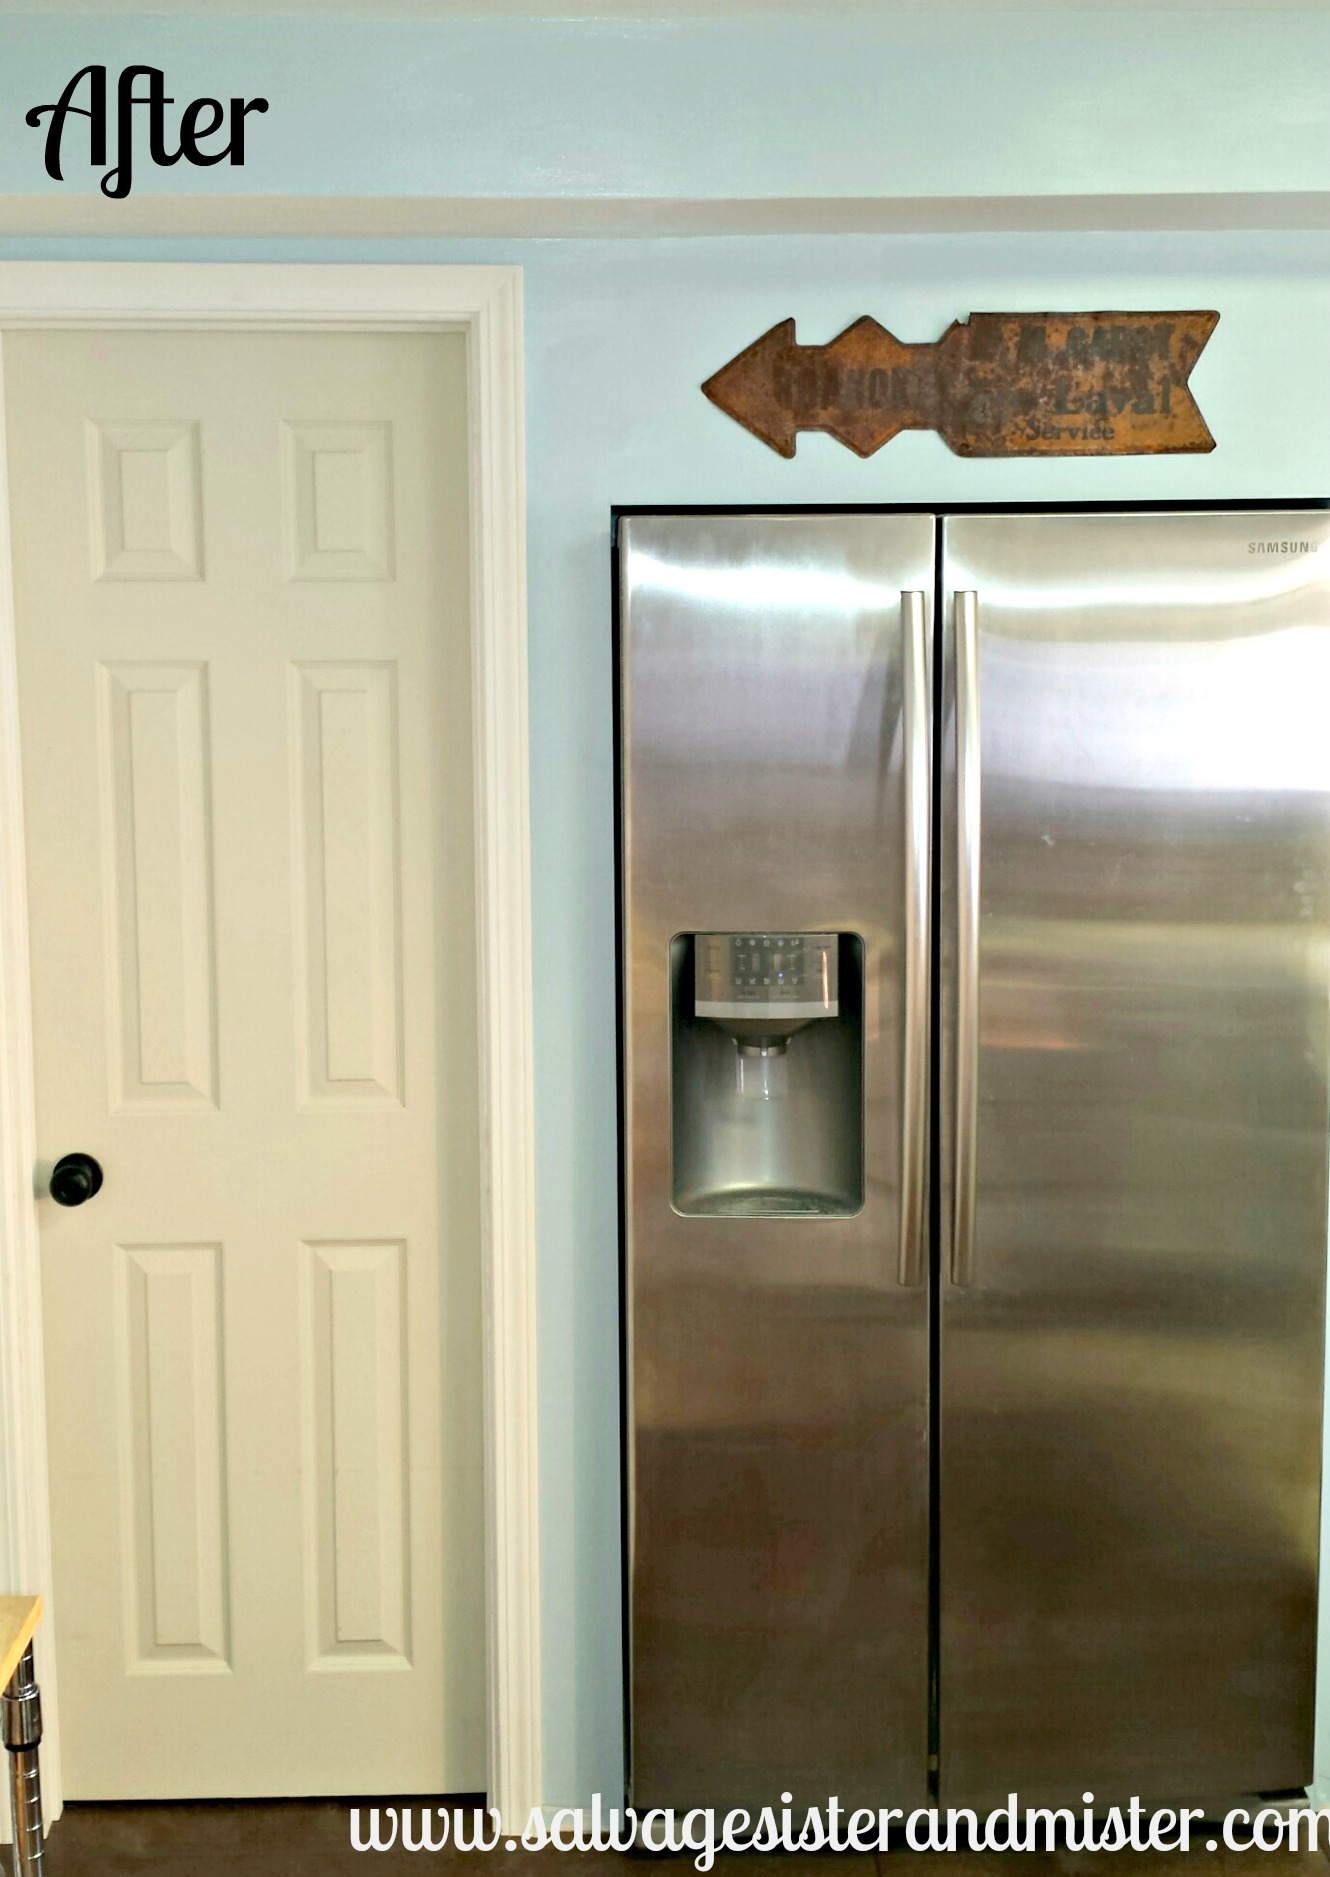 fridge wall after 1